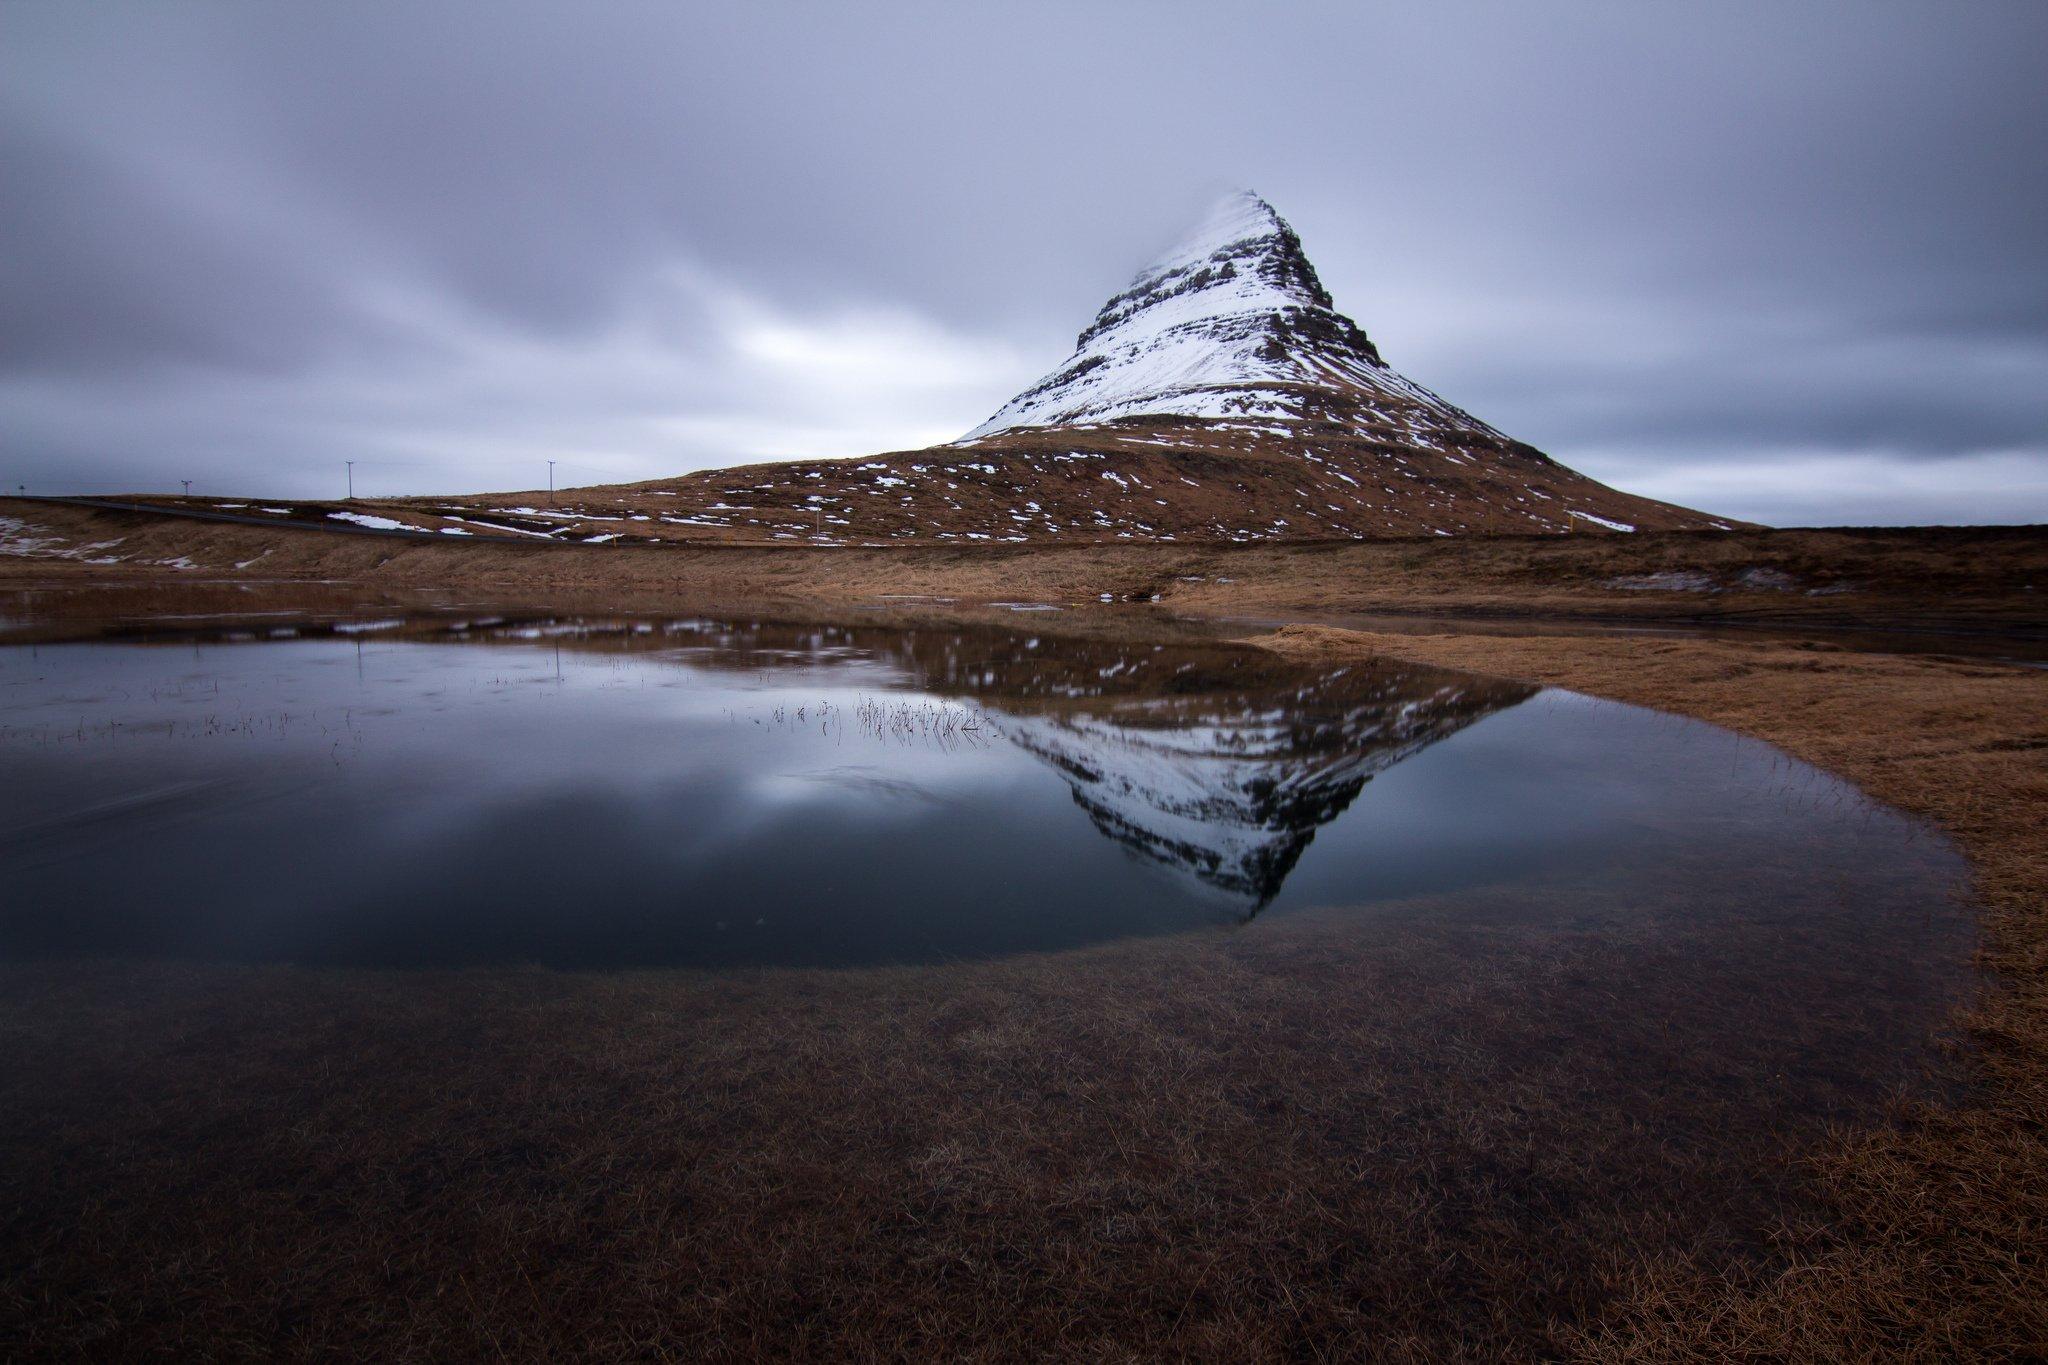 Peace Black Wallpaper Kirkjufell Volcano Mountain River Iceland Reflection